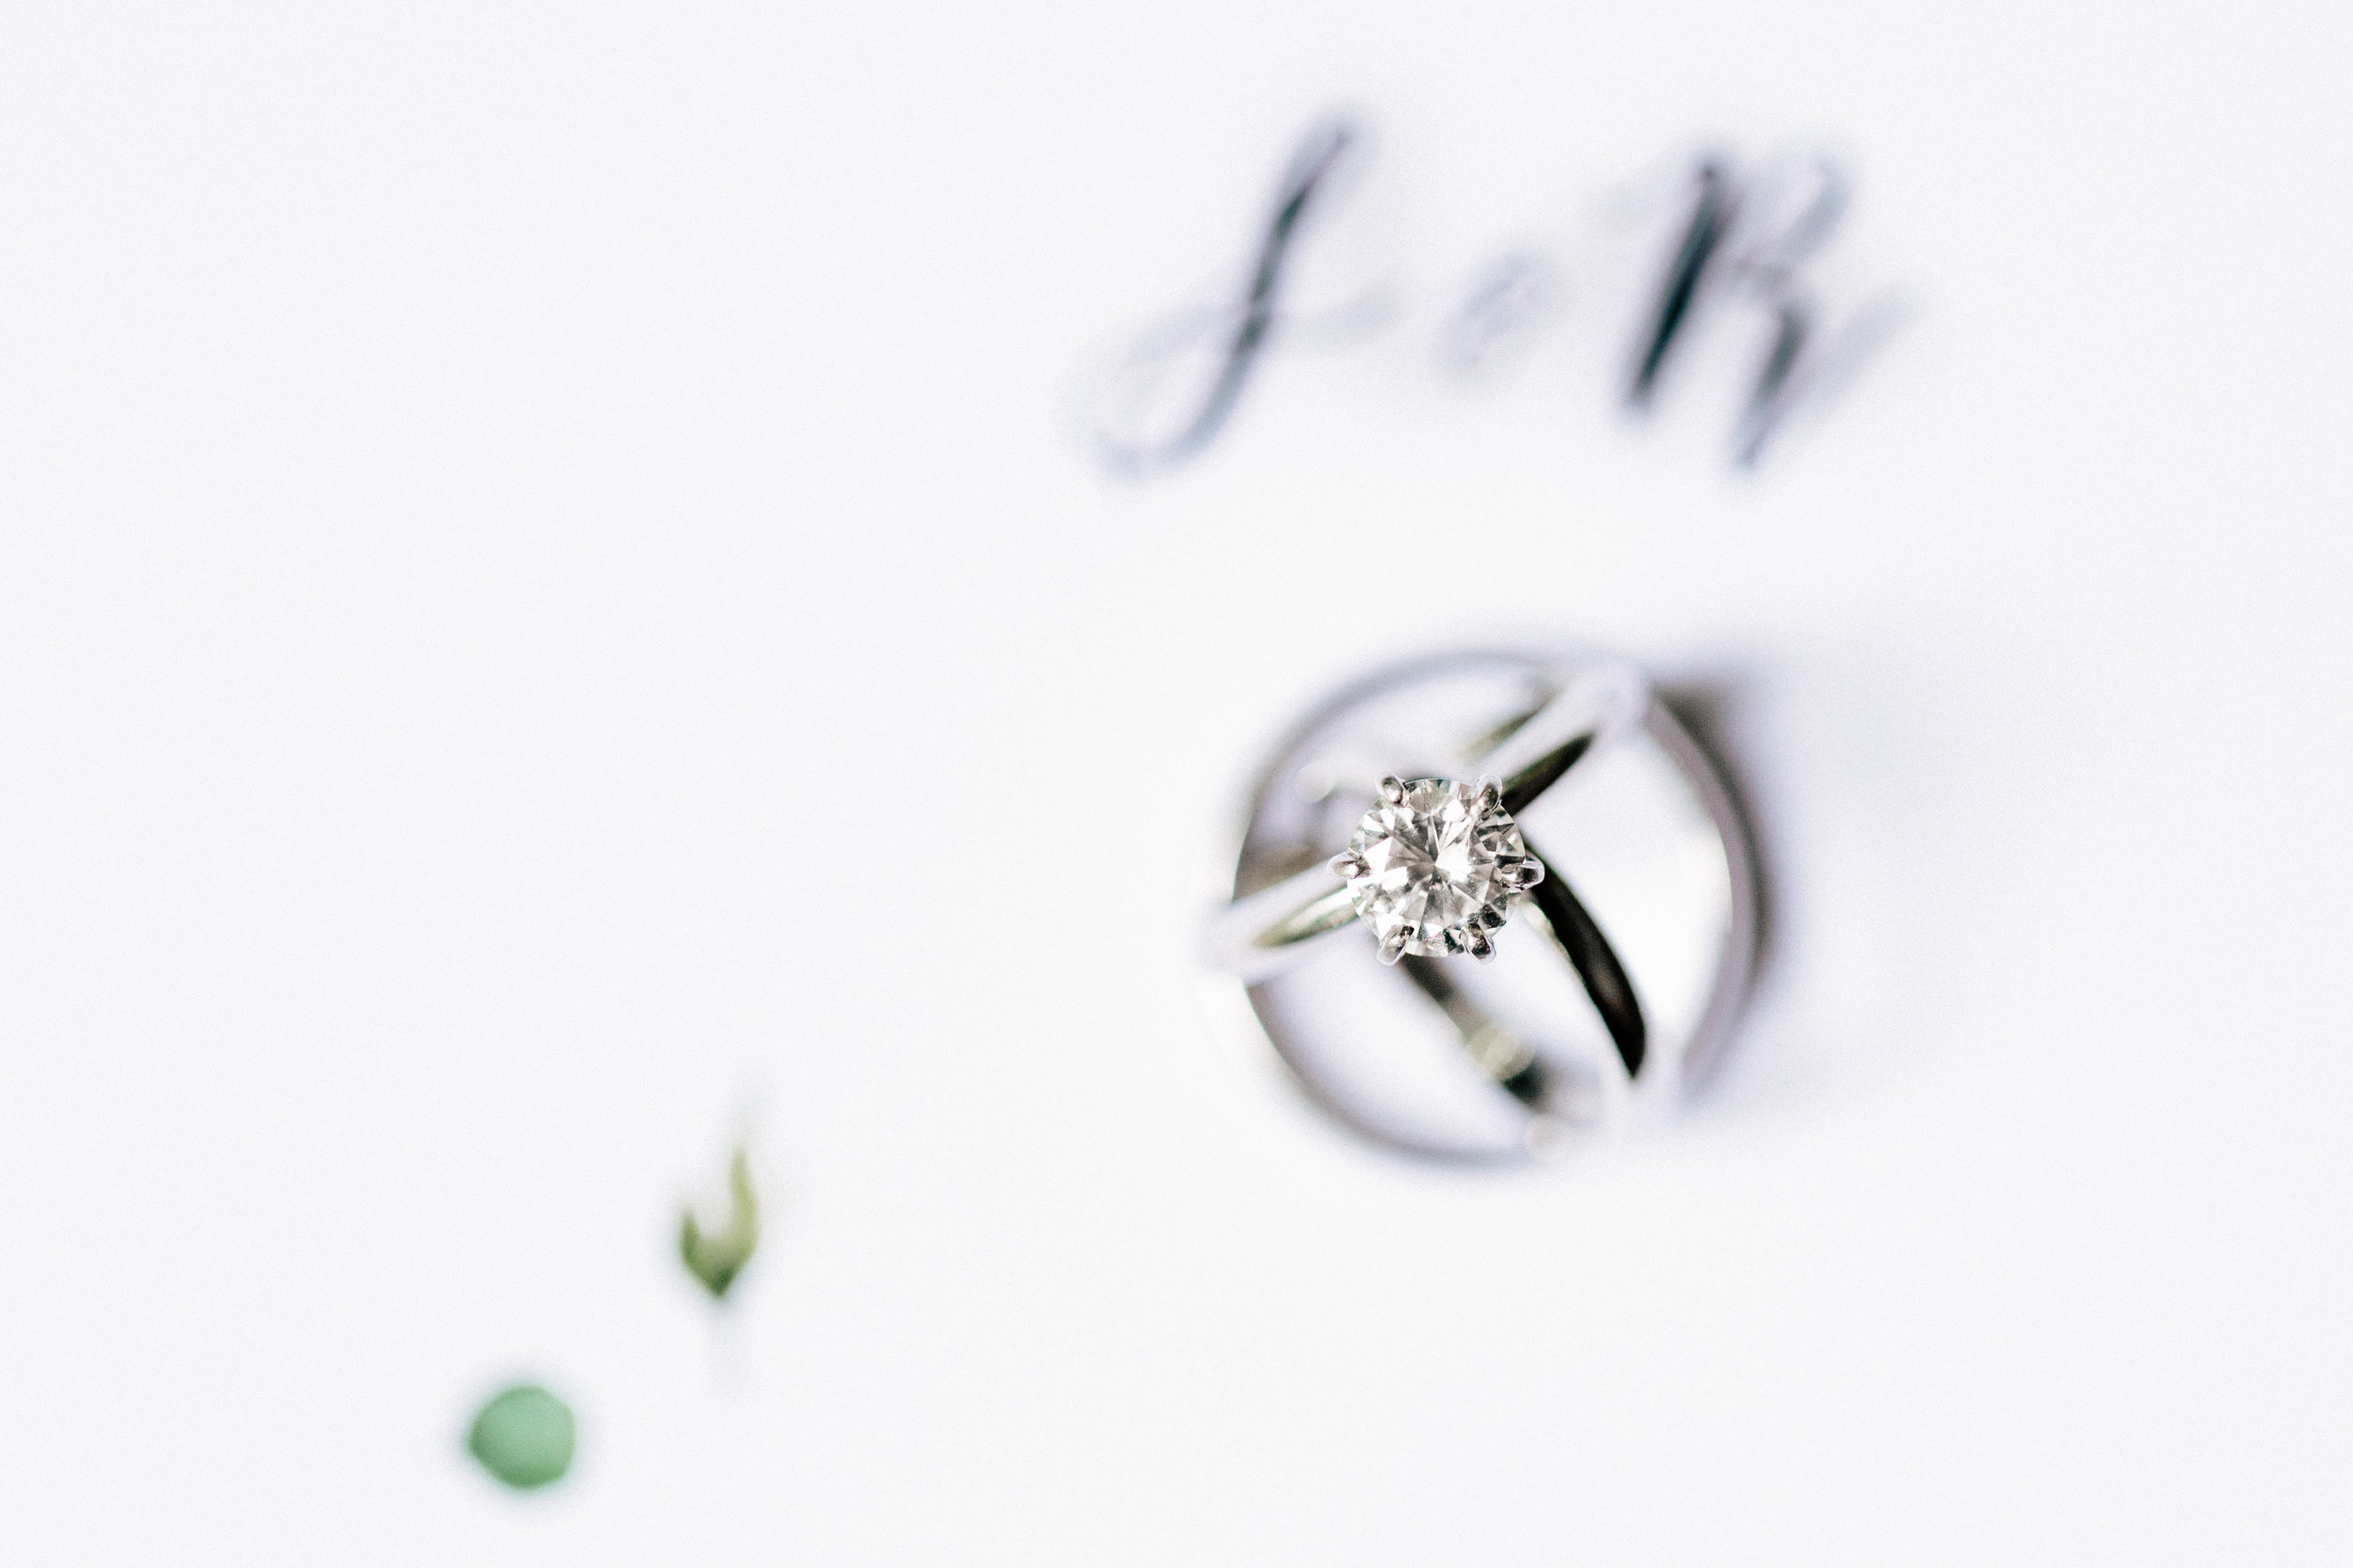 saundra_megan_photo_wedding_photography6.jpg